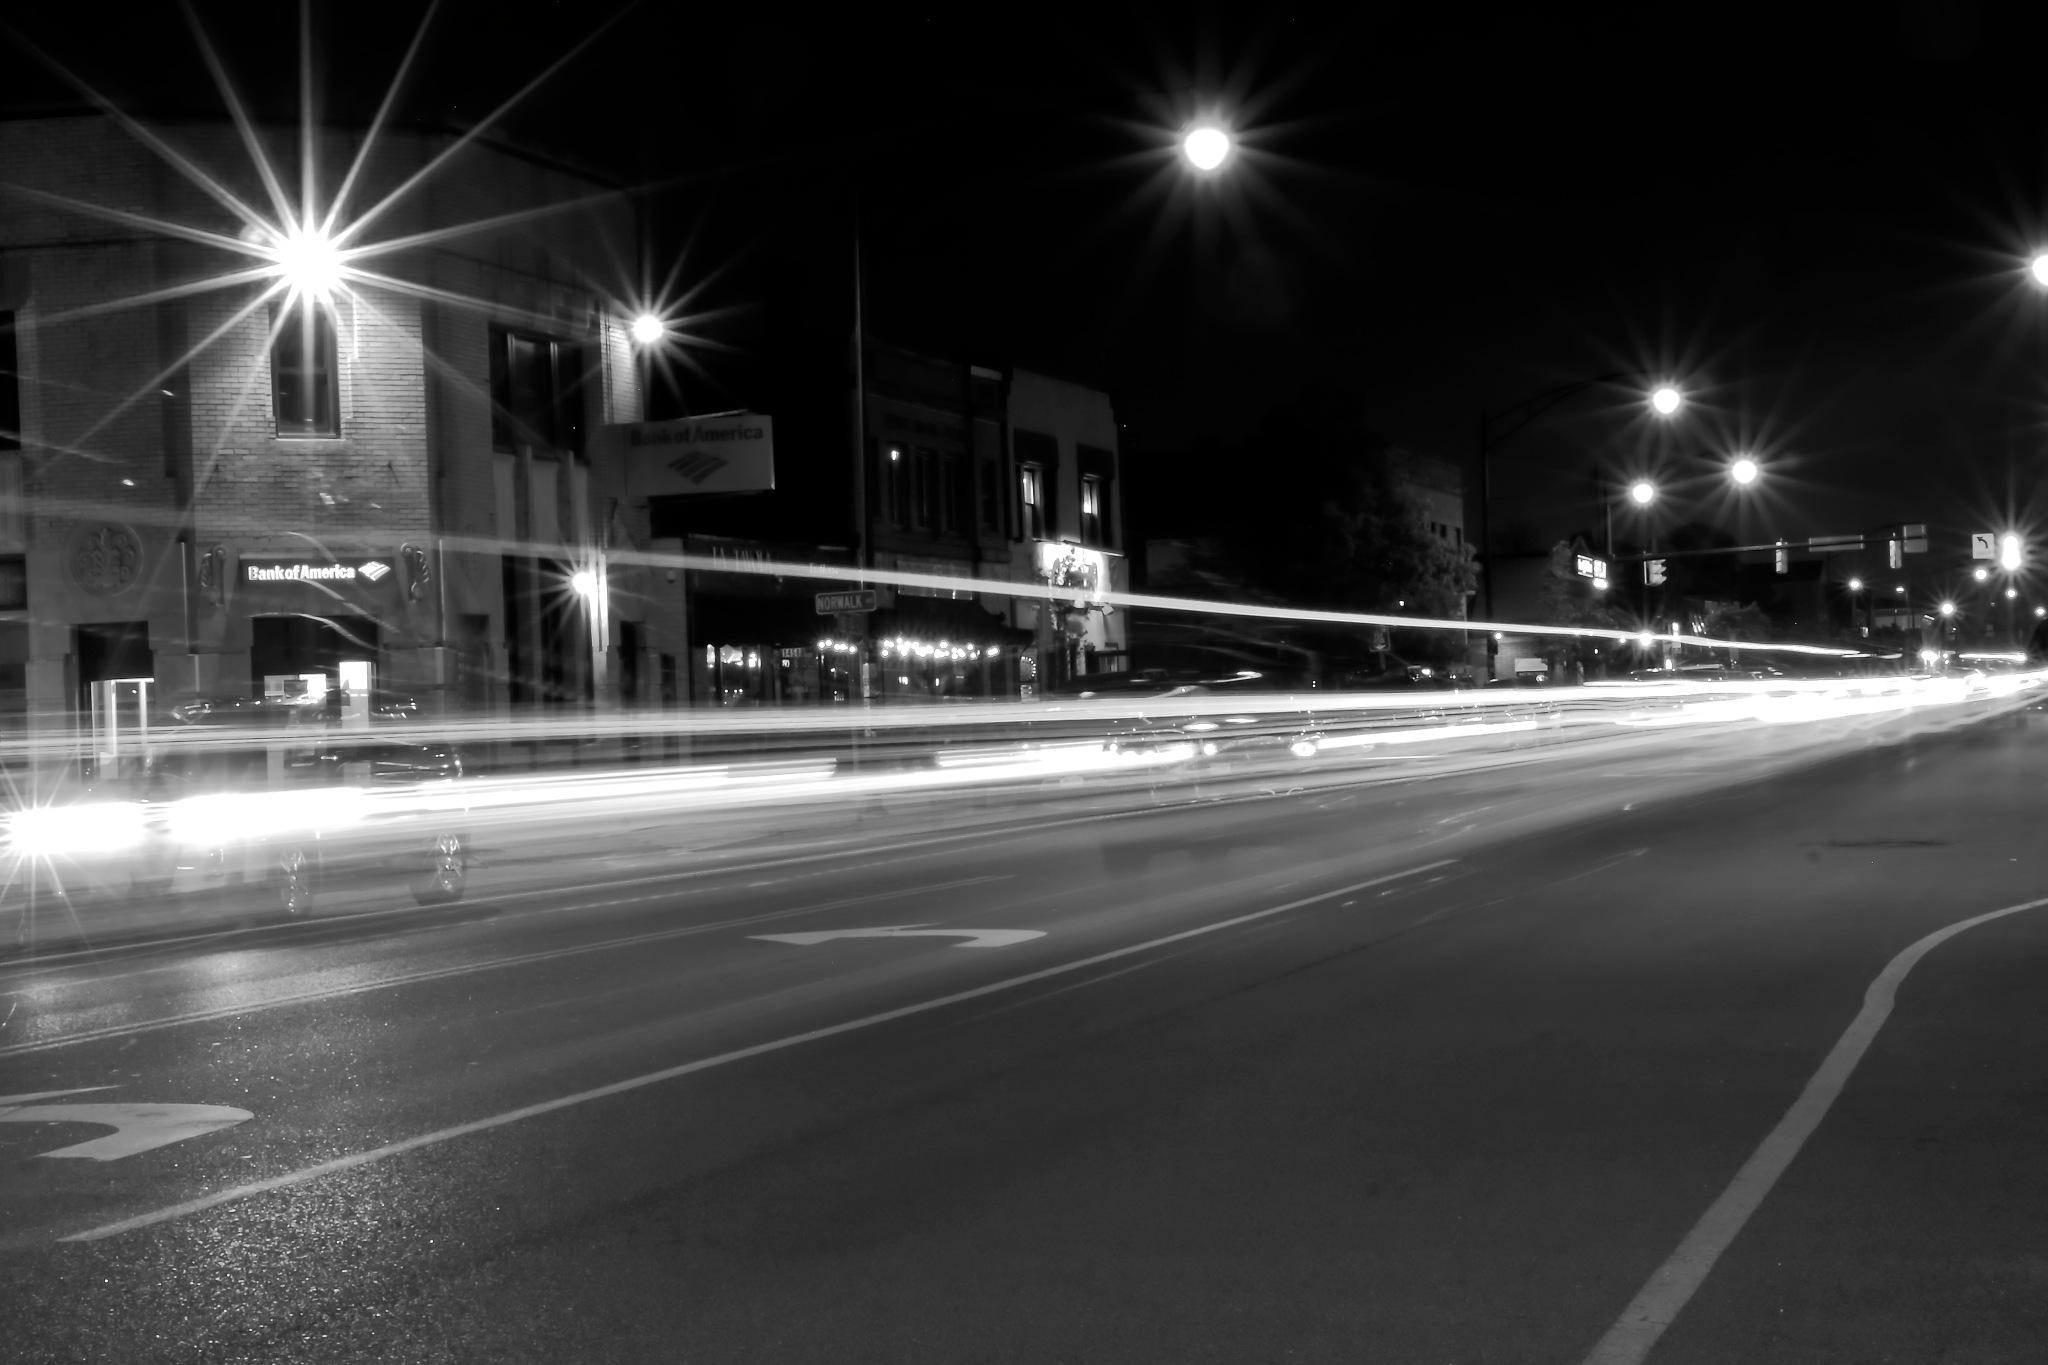 Street at night in Buffalo, New York by Daniel J. Ruggiero